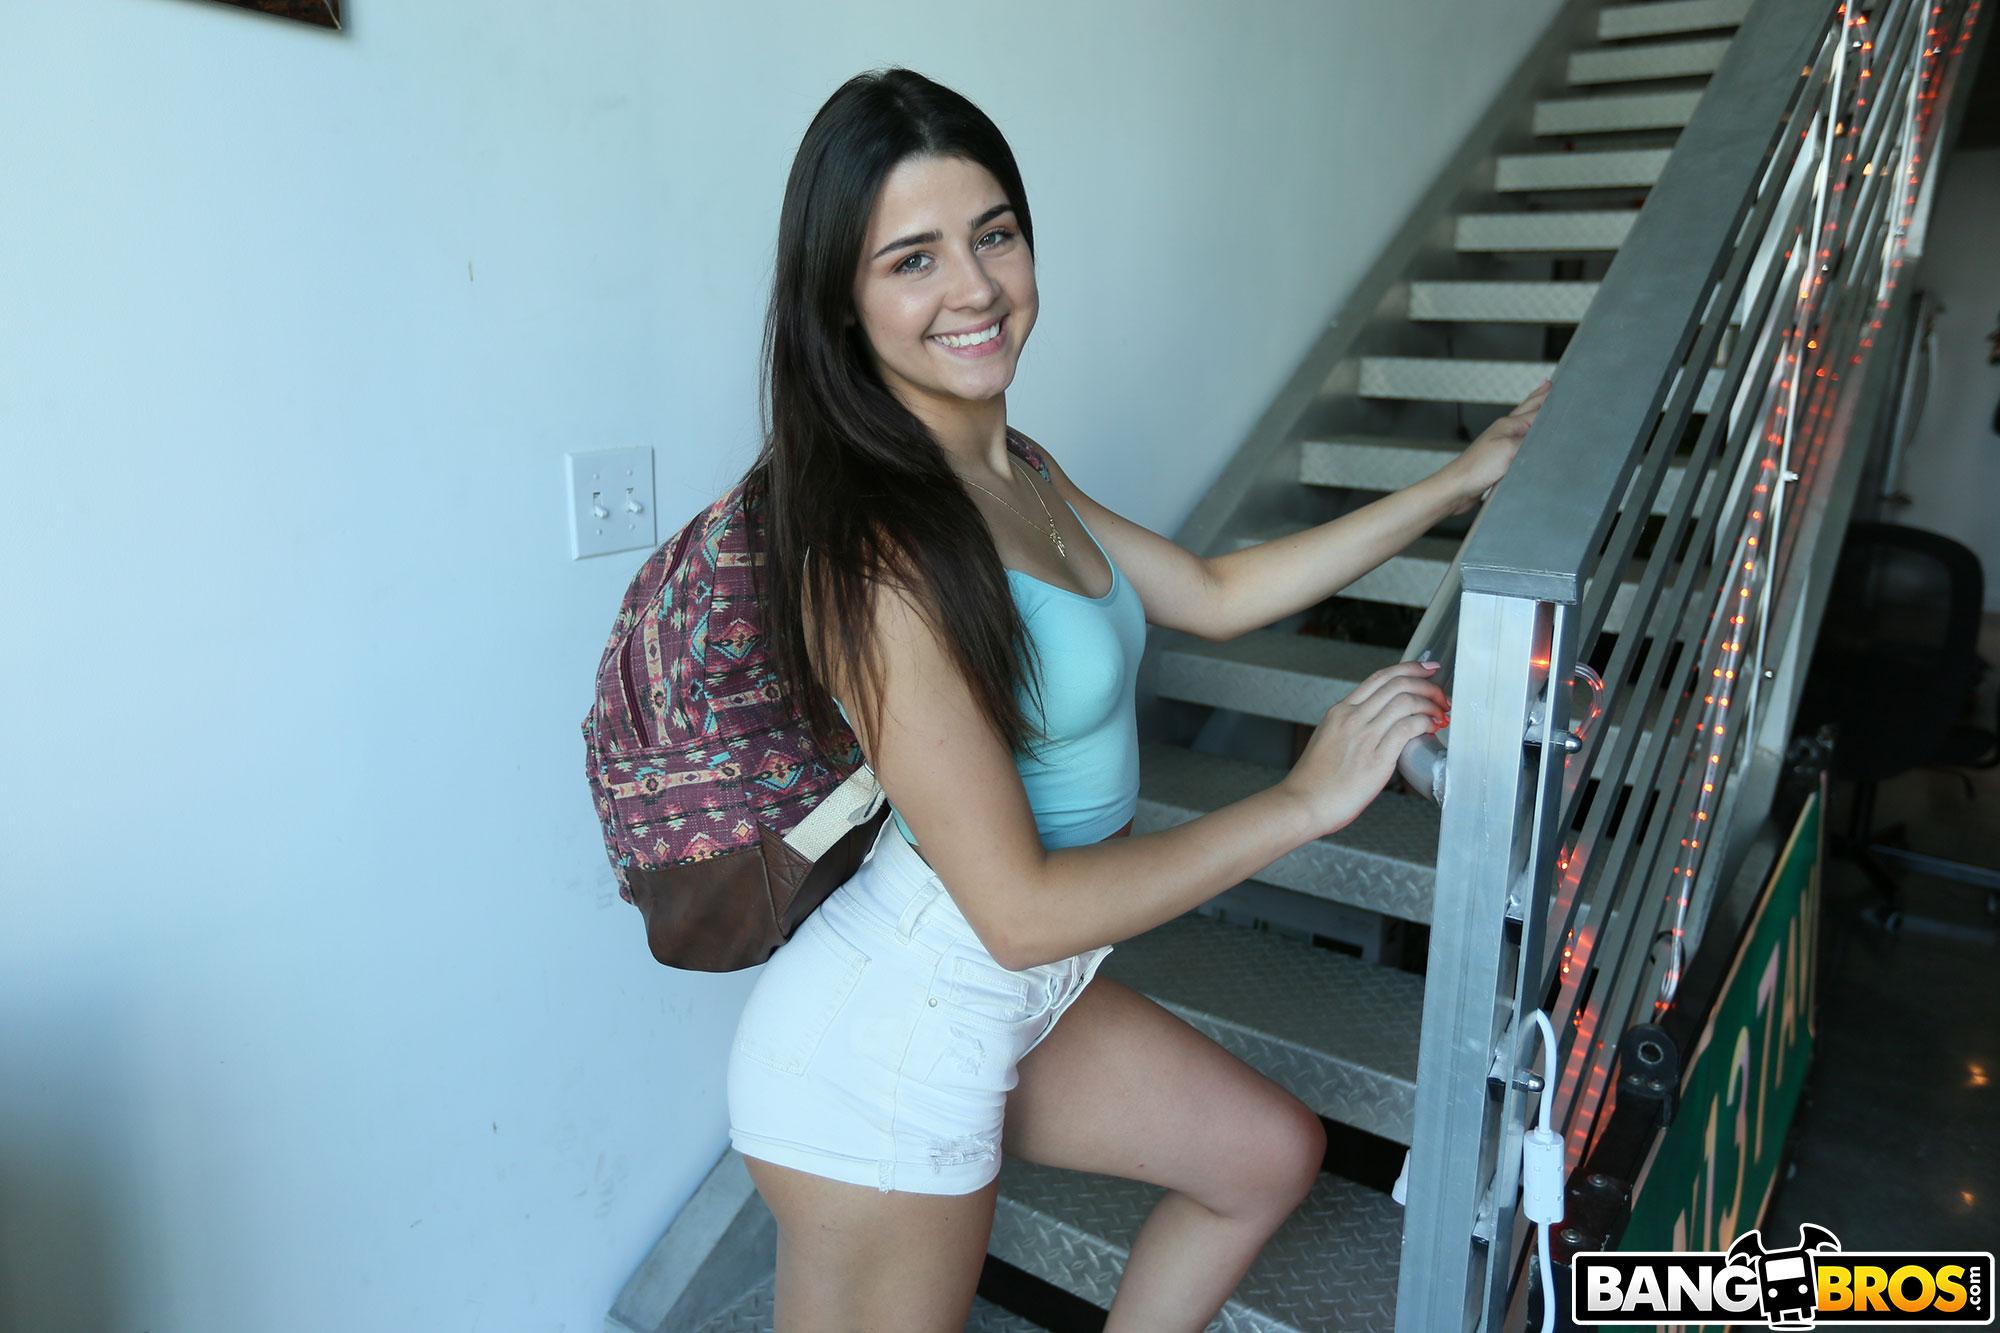 People 2000x1333 Kylie Rocket women pornstar long hair dark hair Latinas bangbros